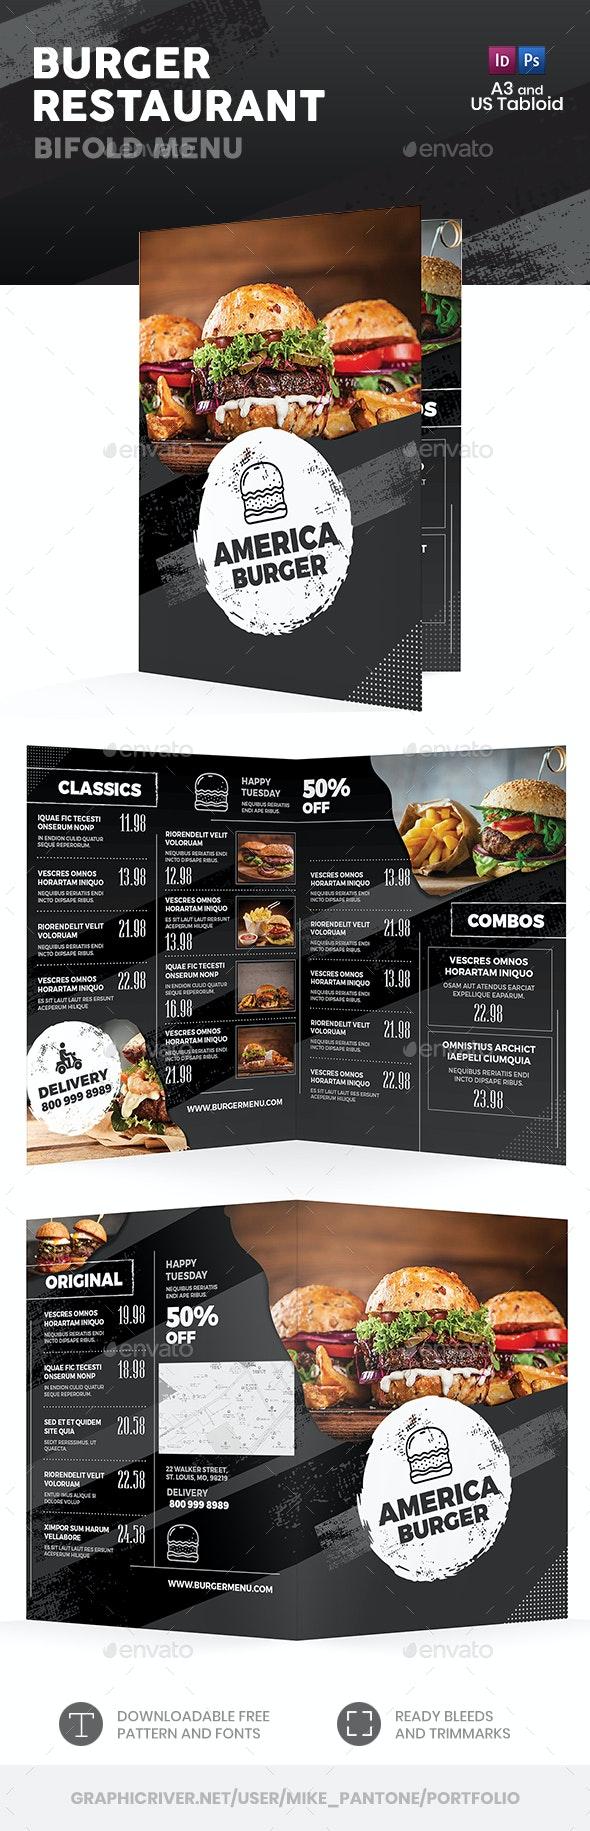 Burger Restaurant Bifold / Halffold Menu - Food Menus Print Templates